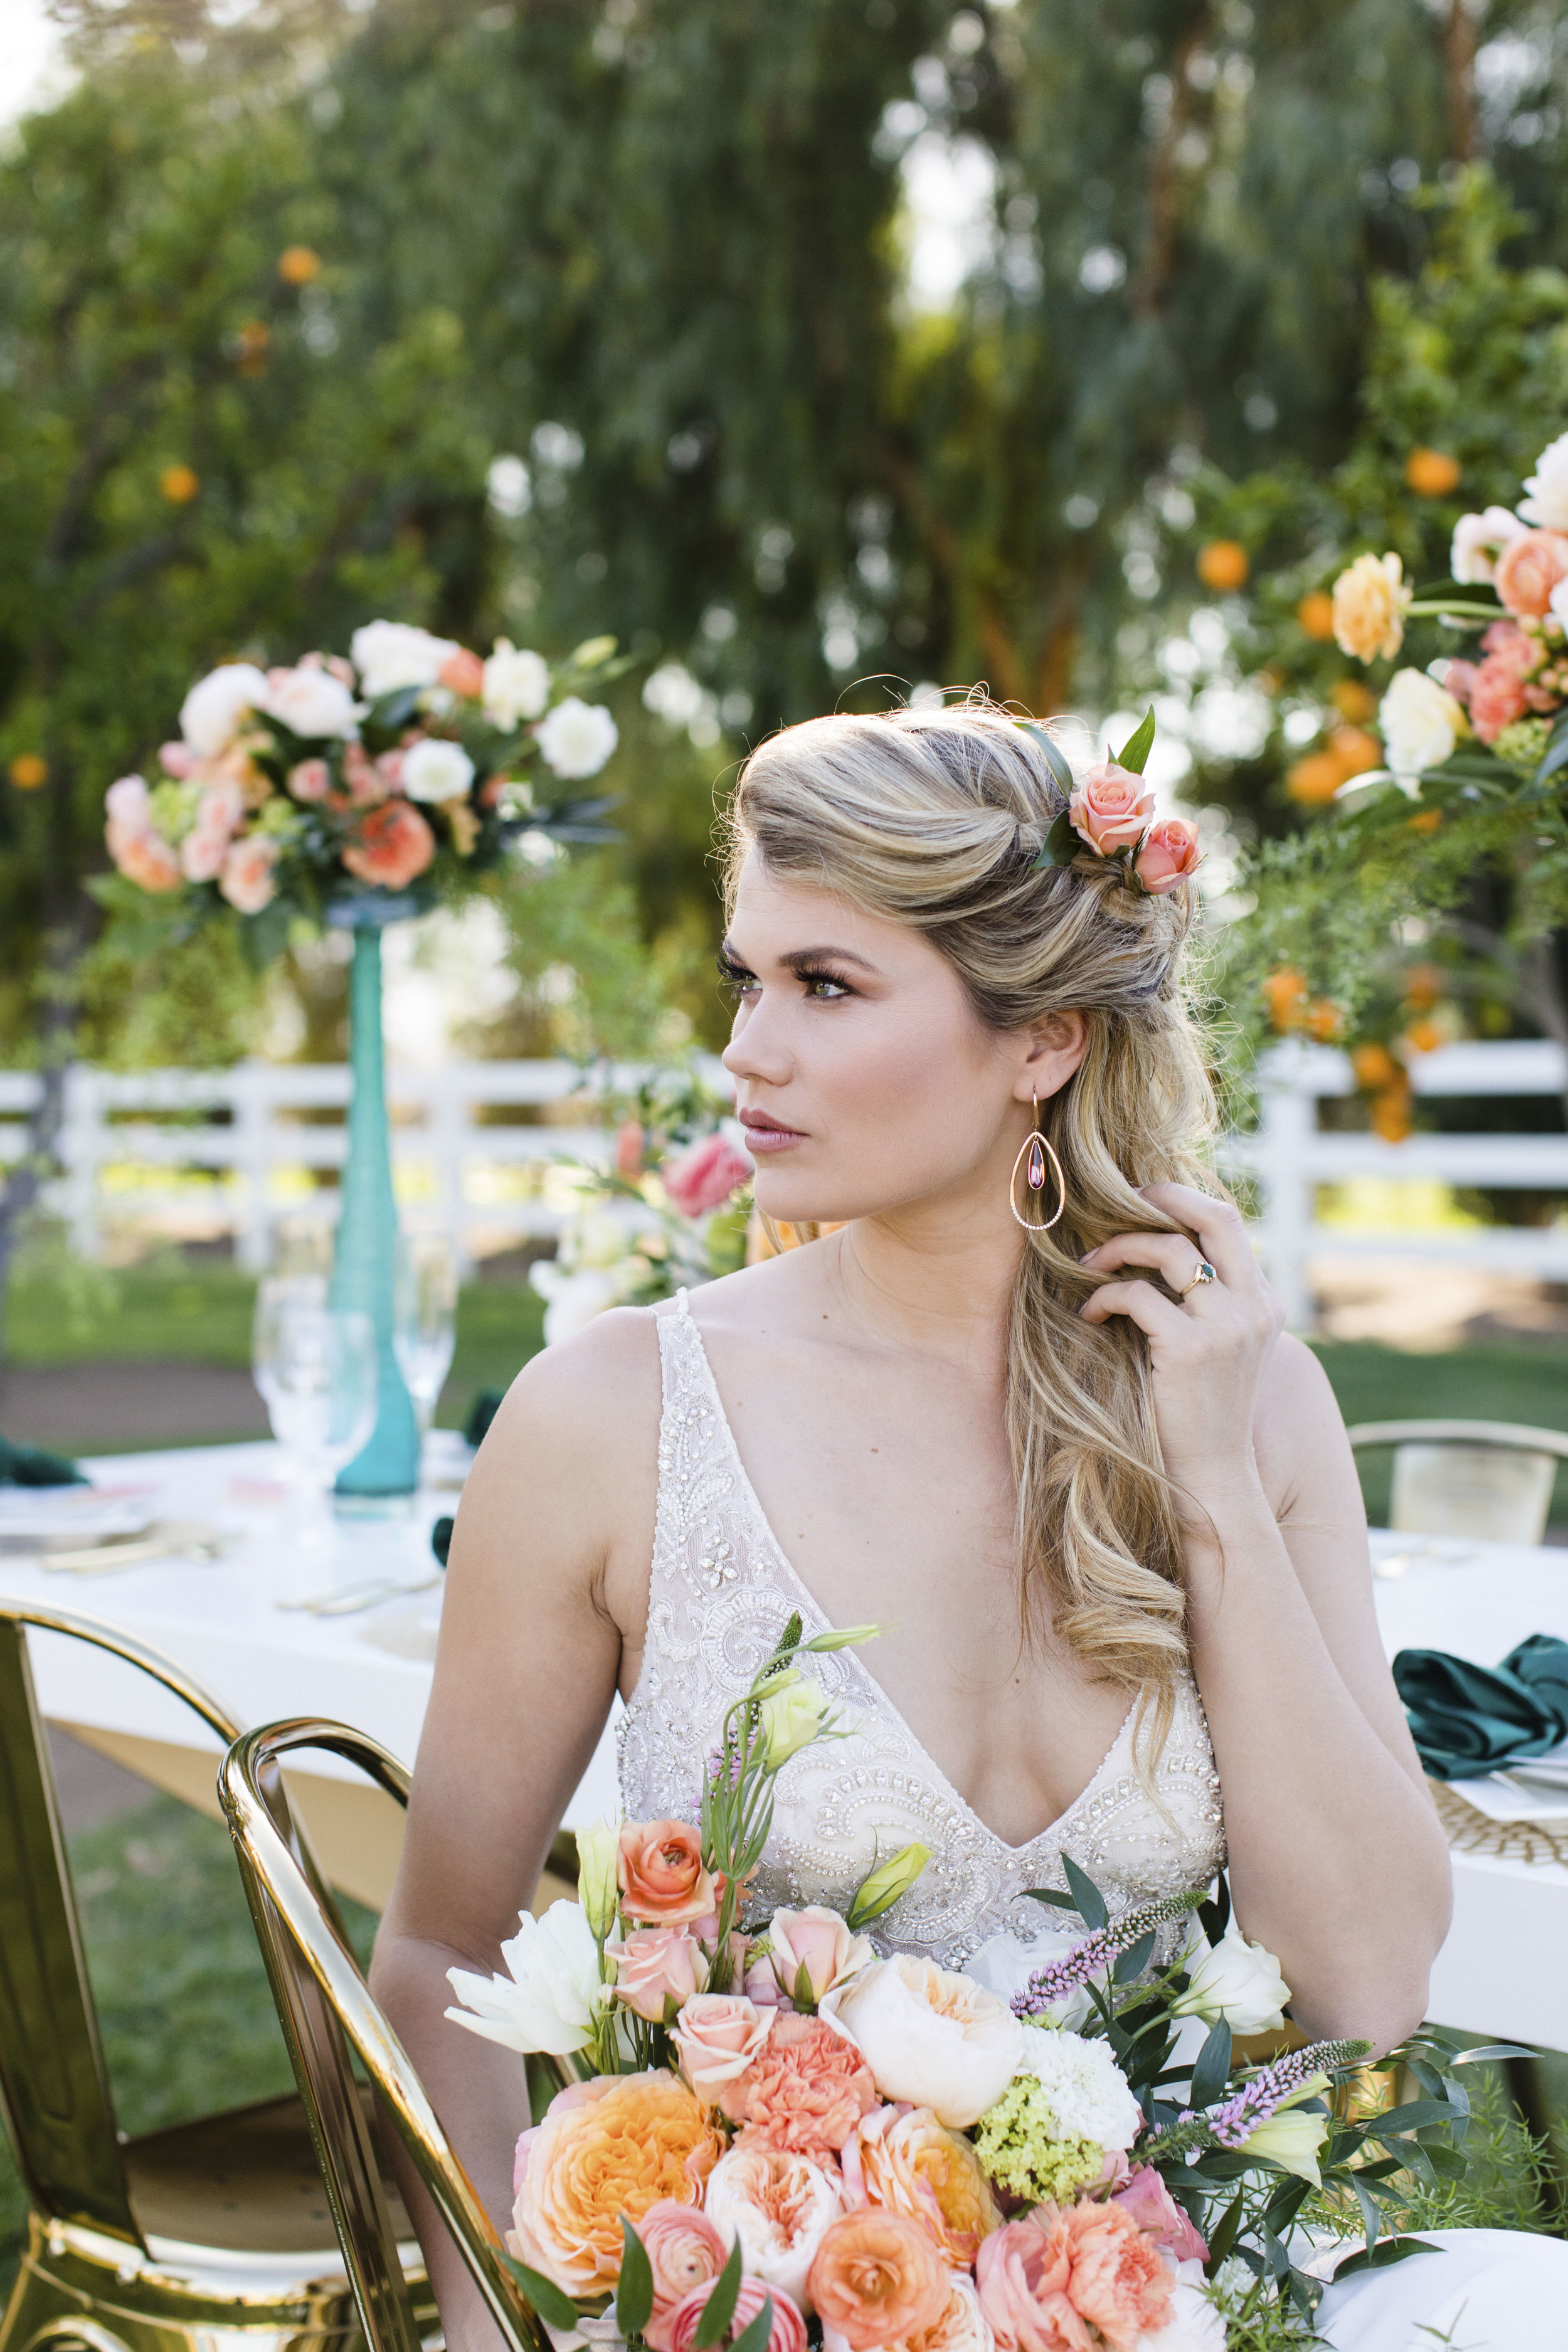 Domenica Beauty _ Hair and Makeup Artist _Styled Shoot _ San Diego, CA _ Rancho Guejito _ 16.JPG